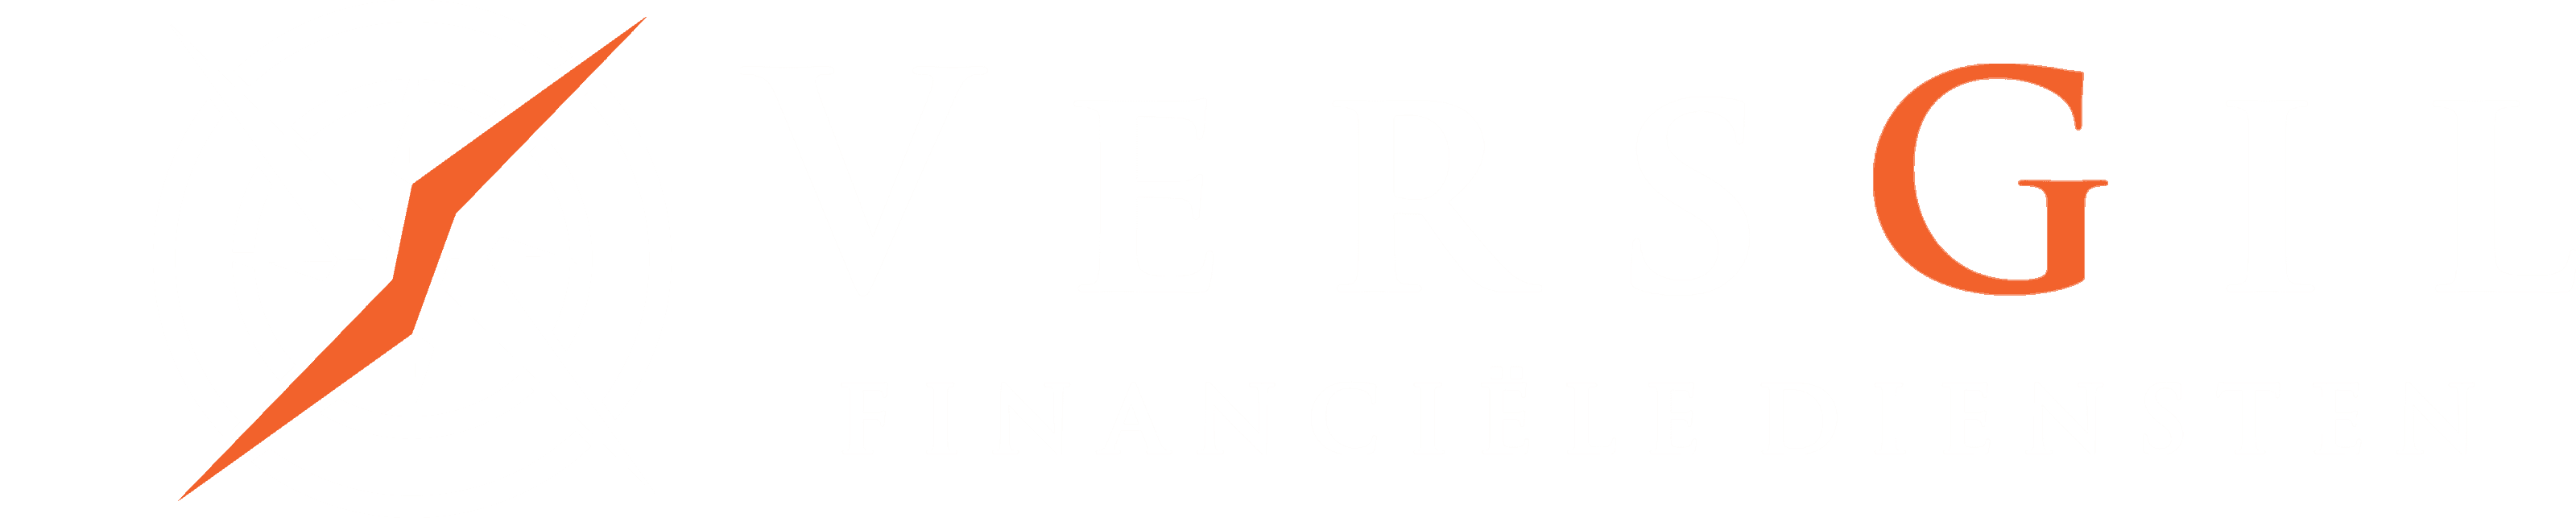 VersGil Financiële diensten